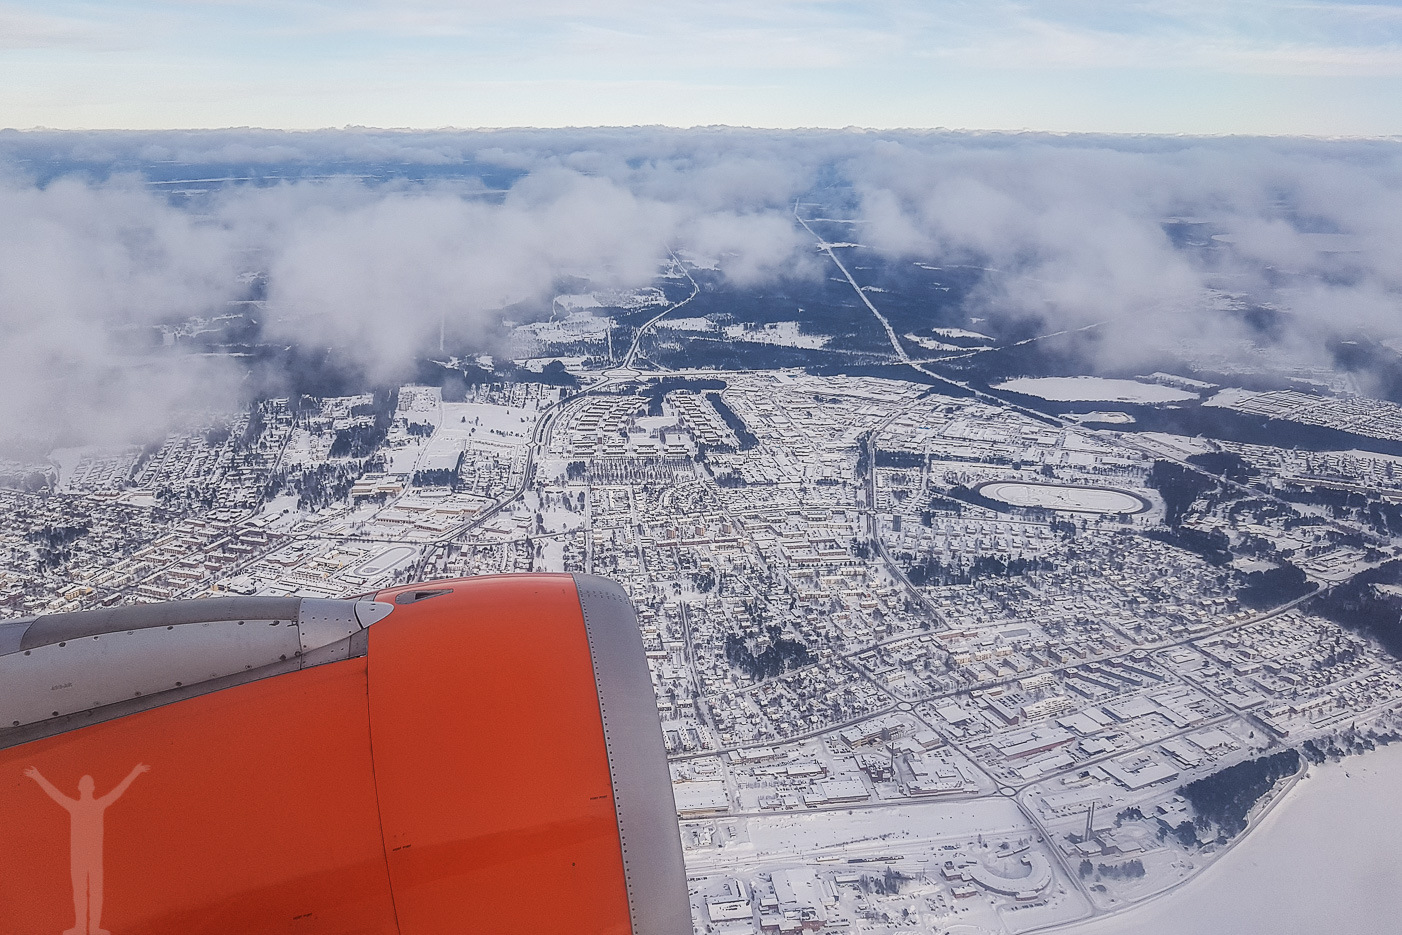 Hejdå Östersund!